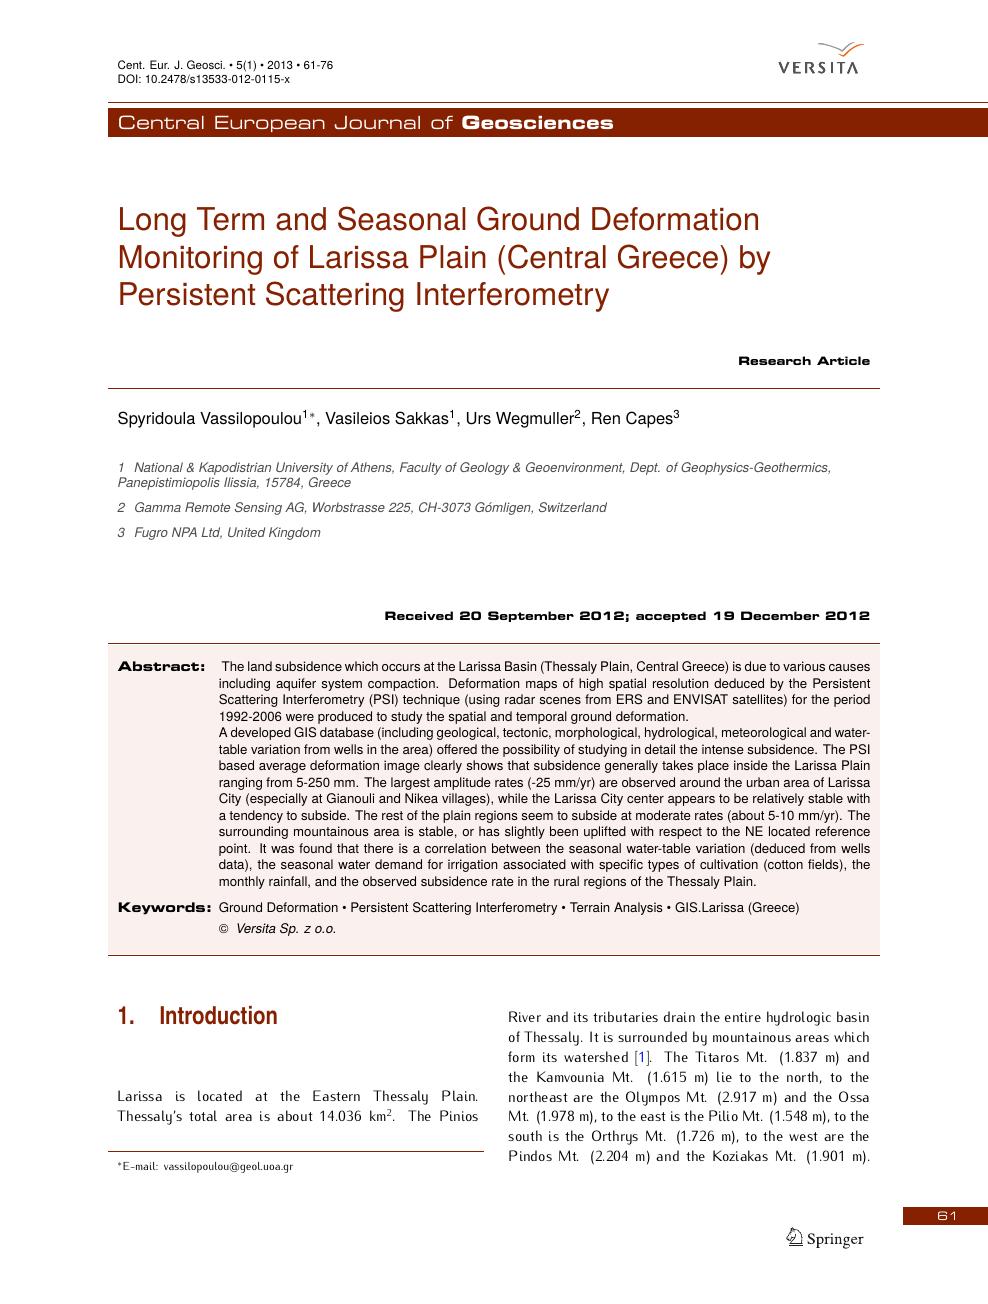 Long term and seasonal ground deformation monitoring of